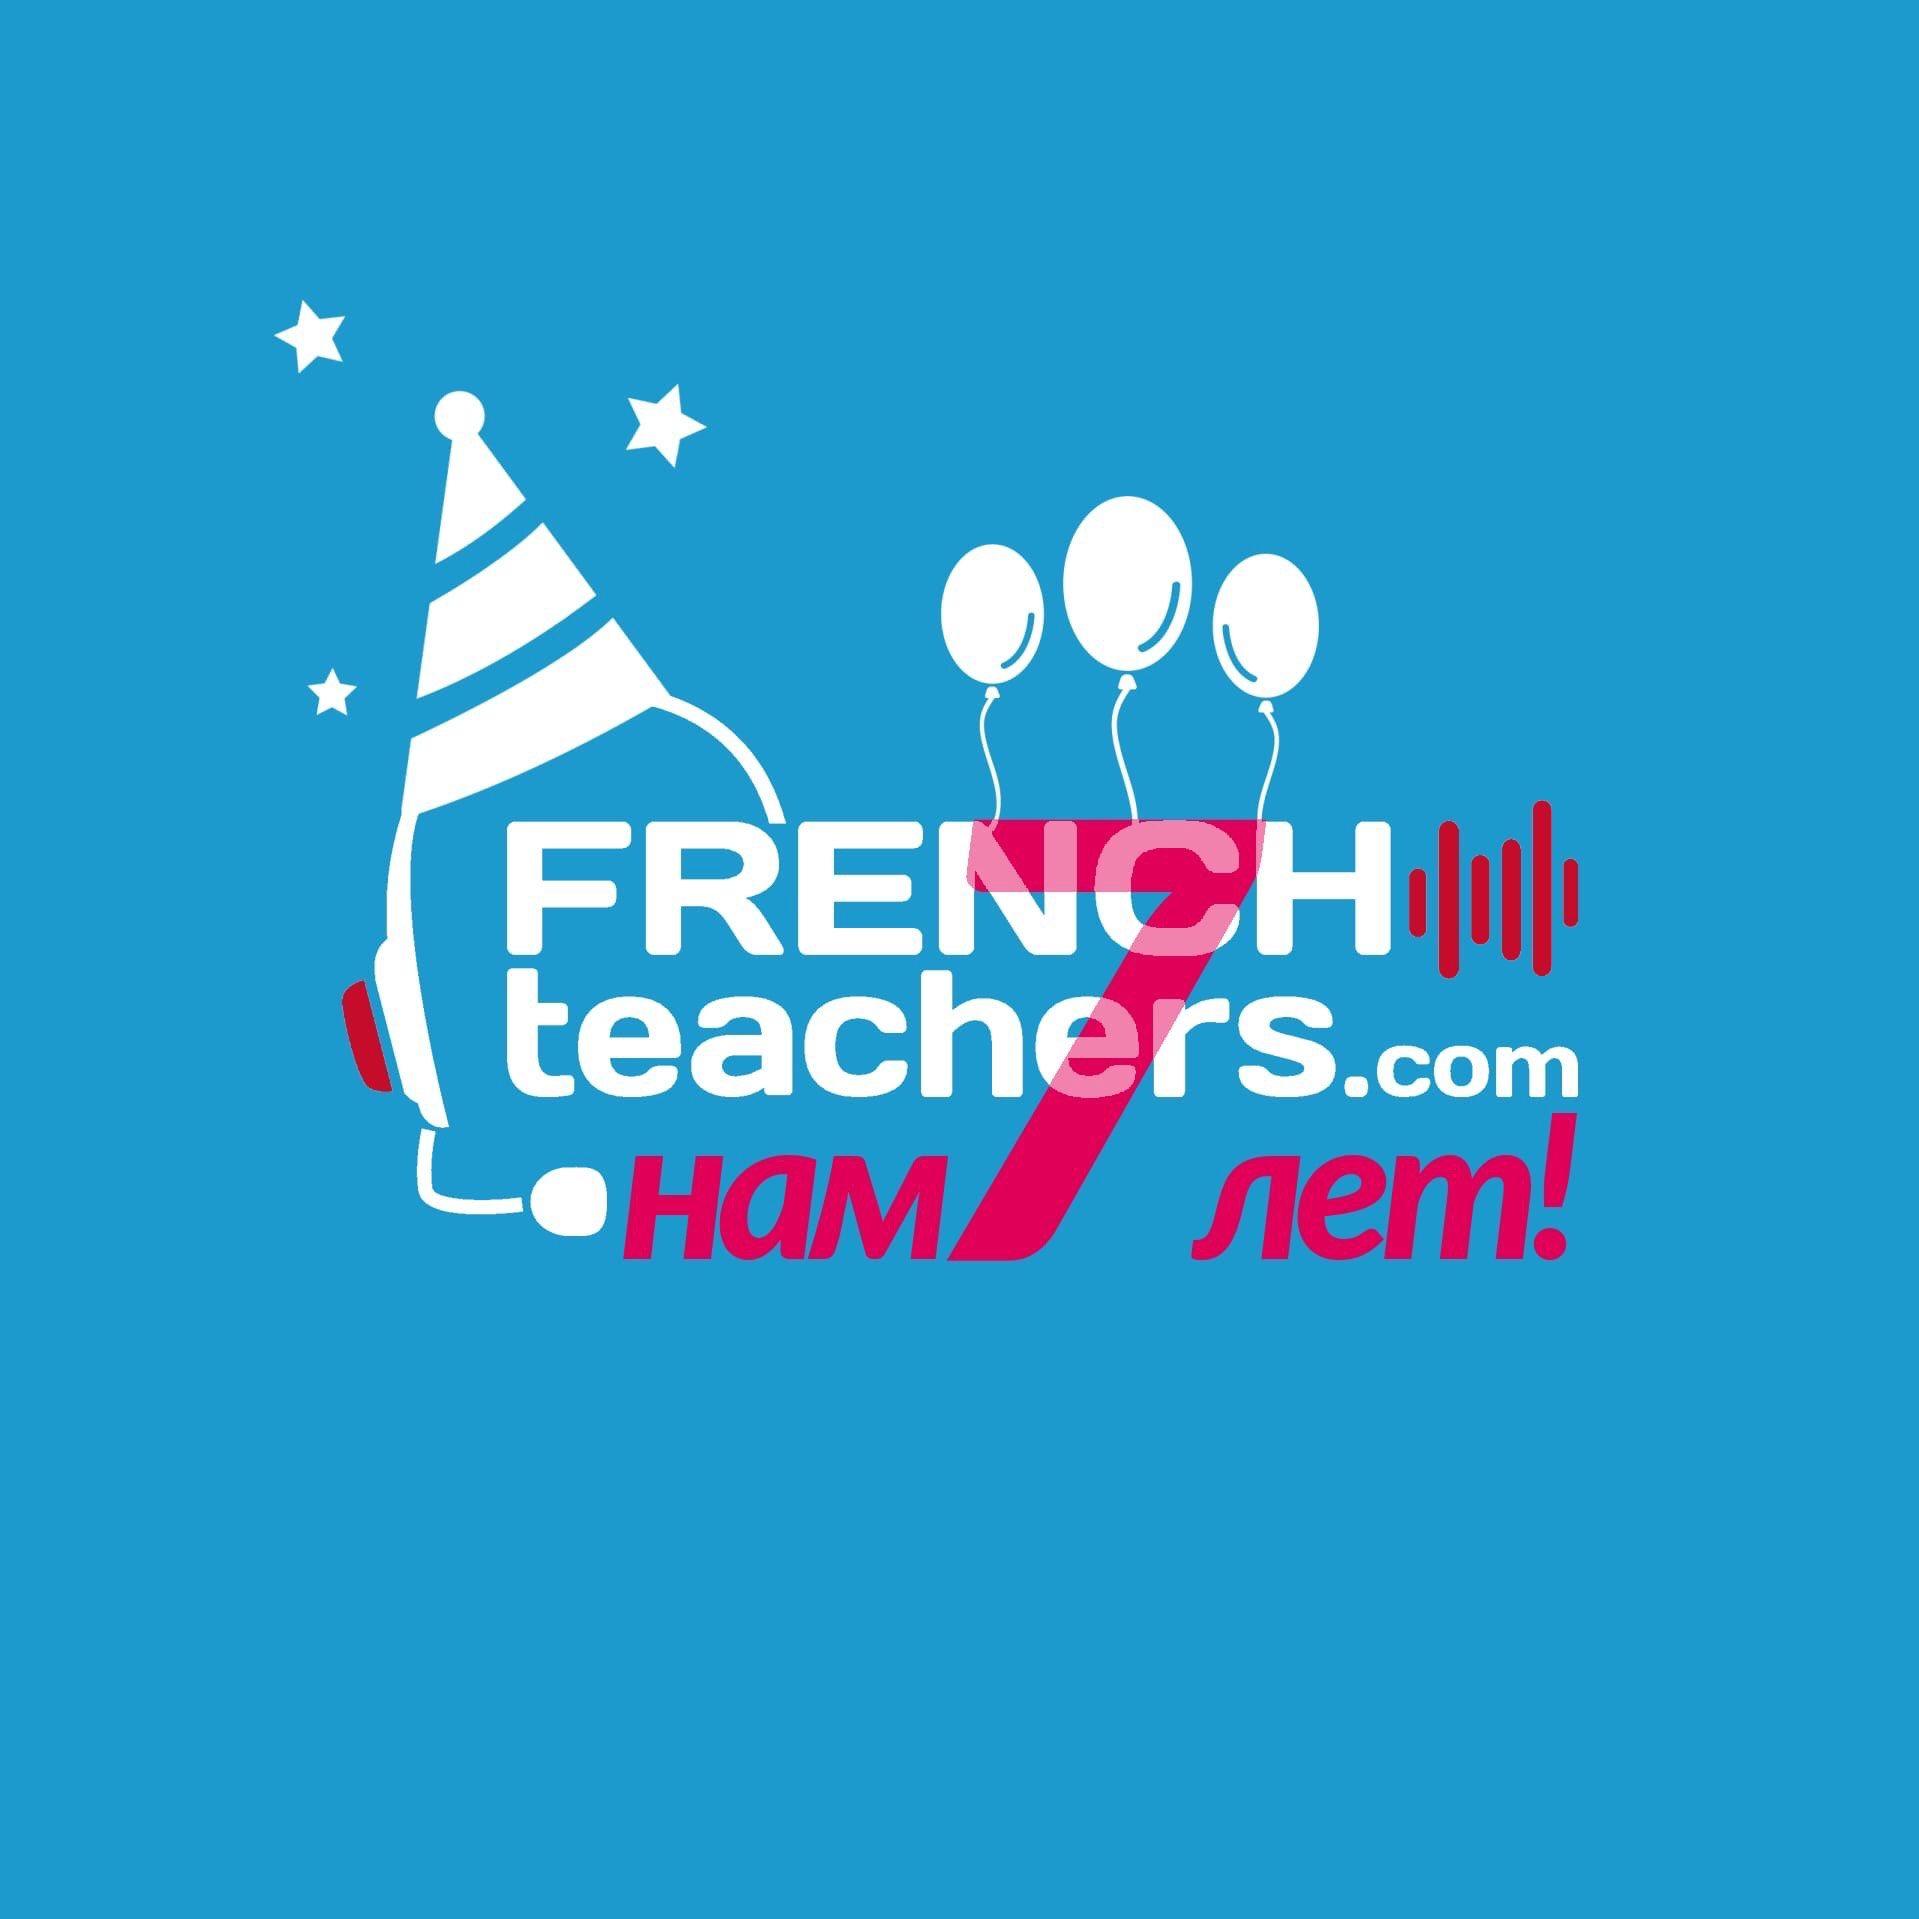 French Teachers